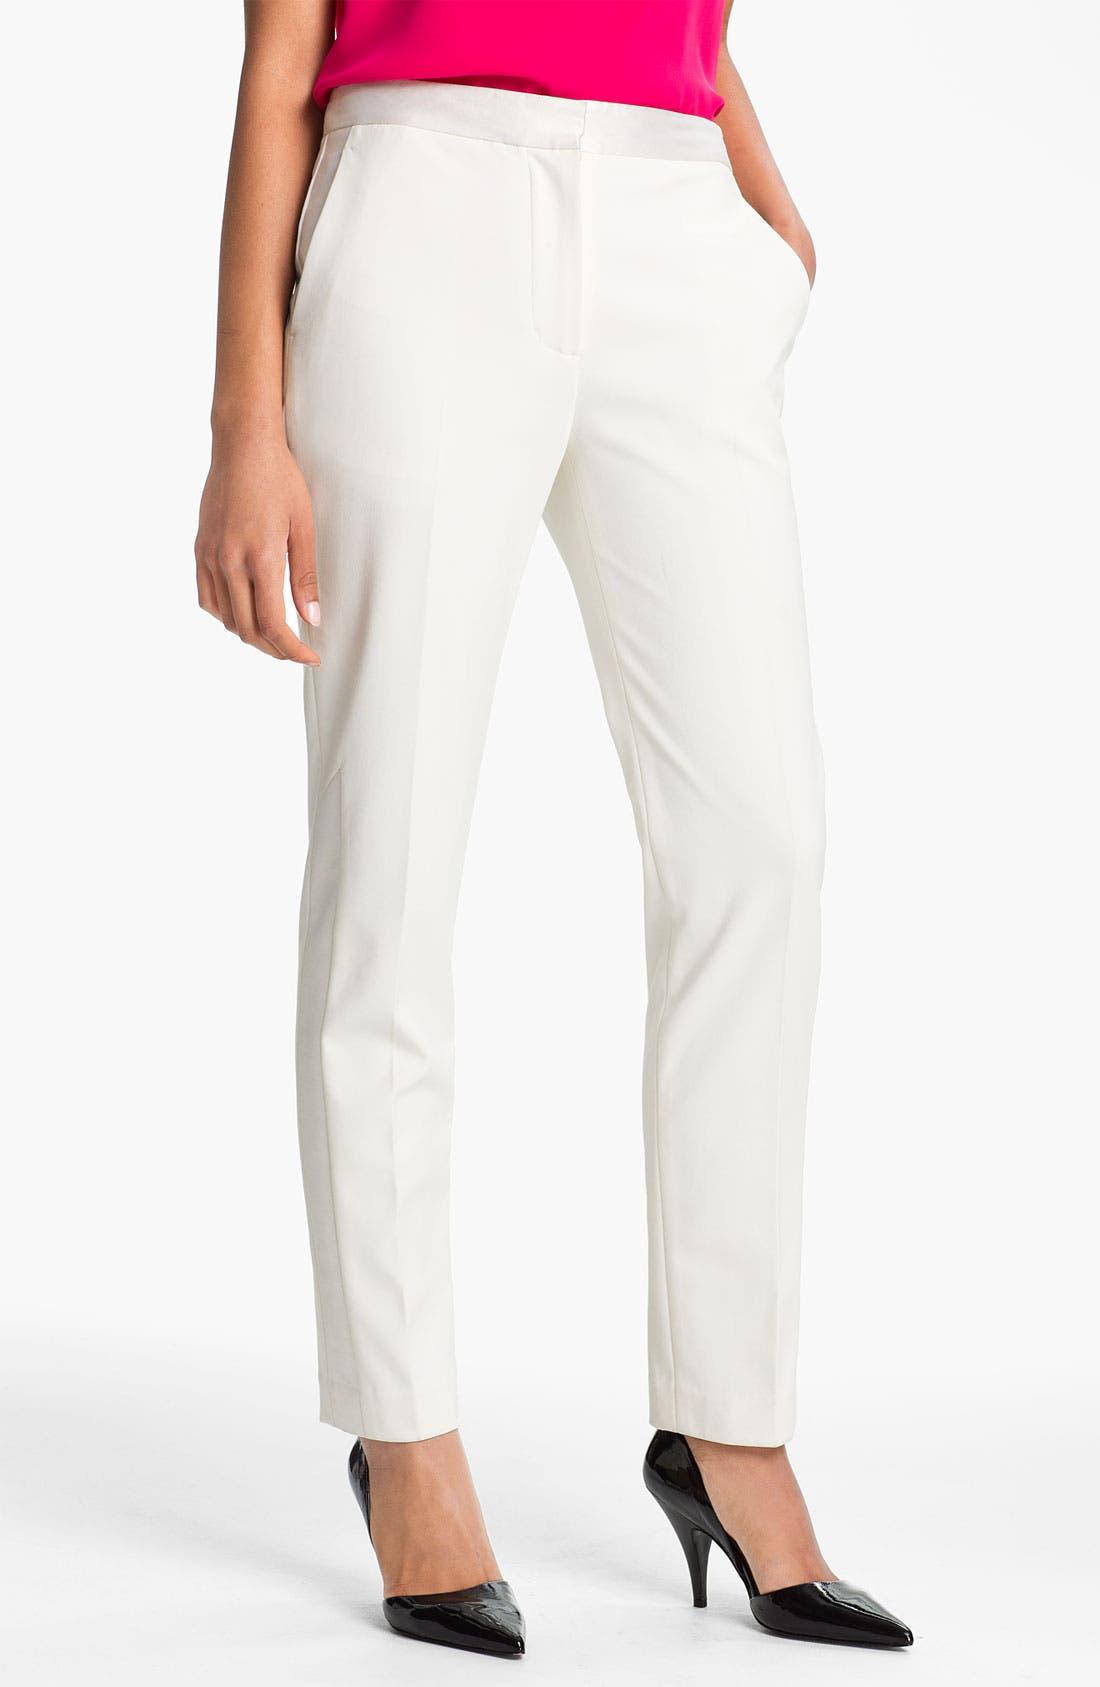 Alternate Image 1 Selected - 3.1 Phillip Lim Slim Tuxedo Pants